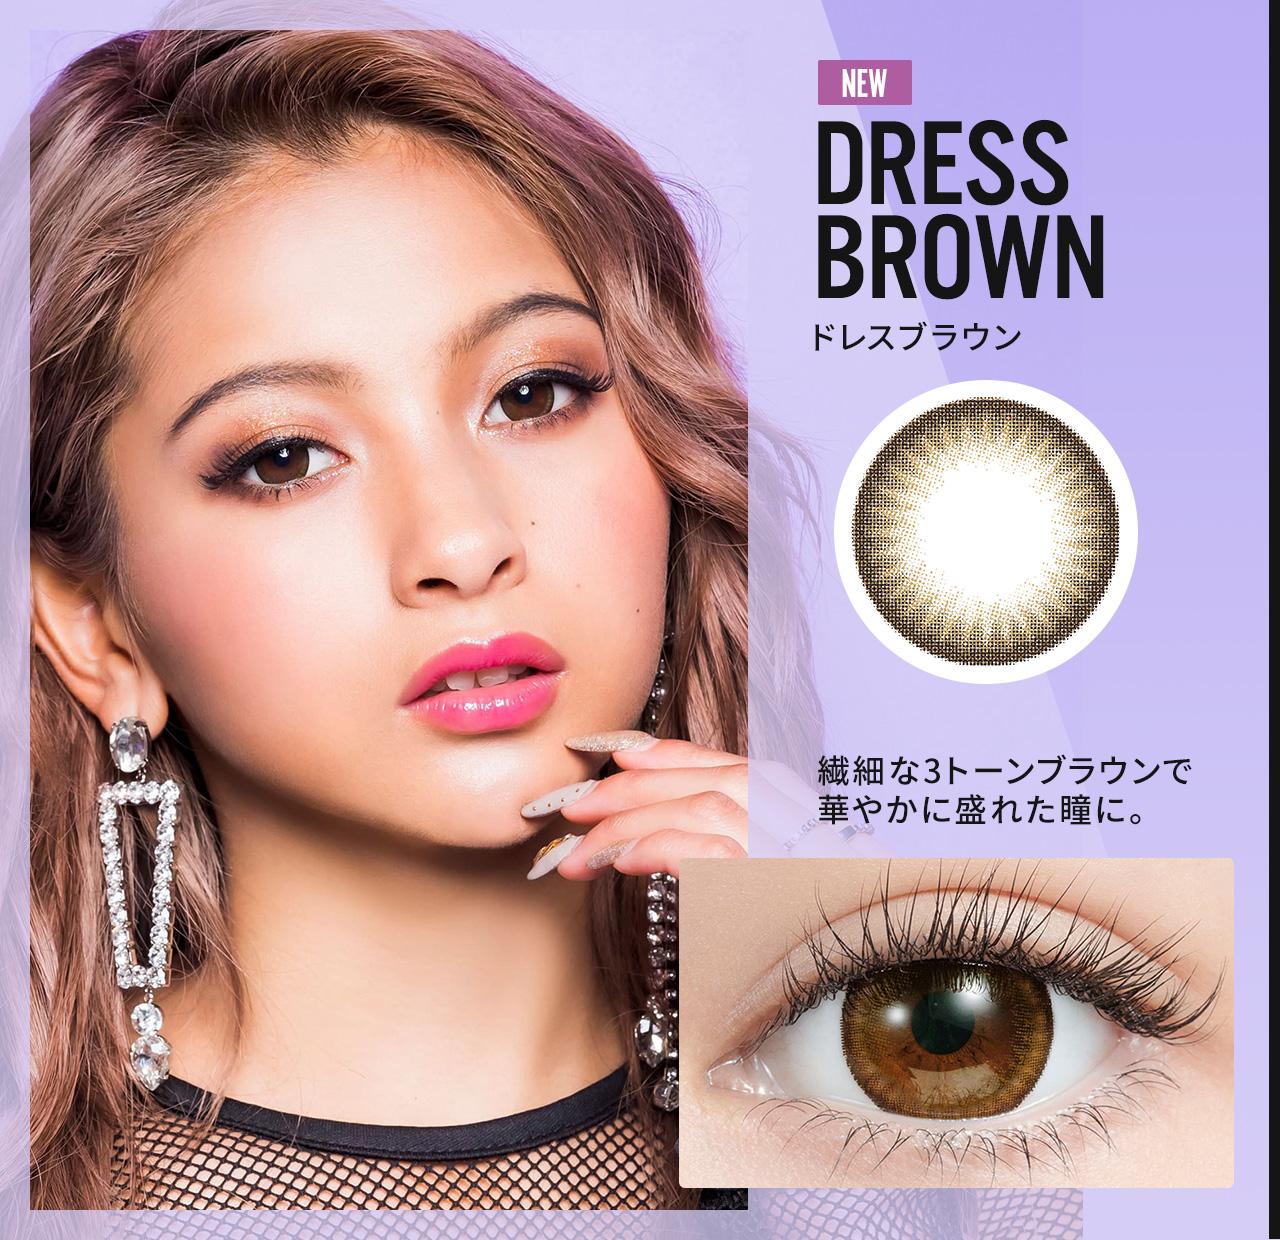 DRESS BROWN ドレスブラウン